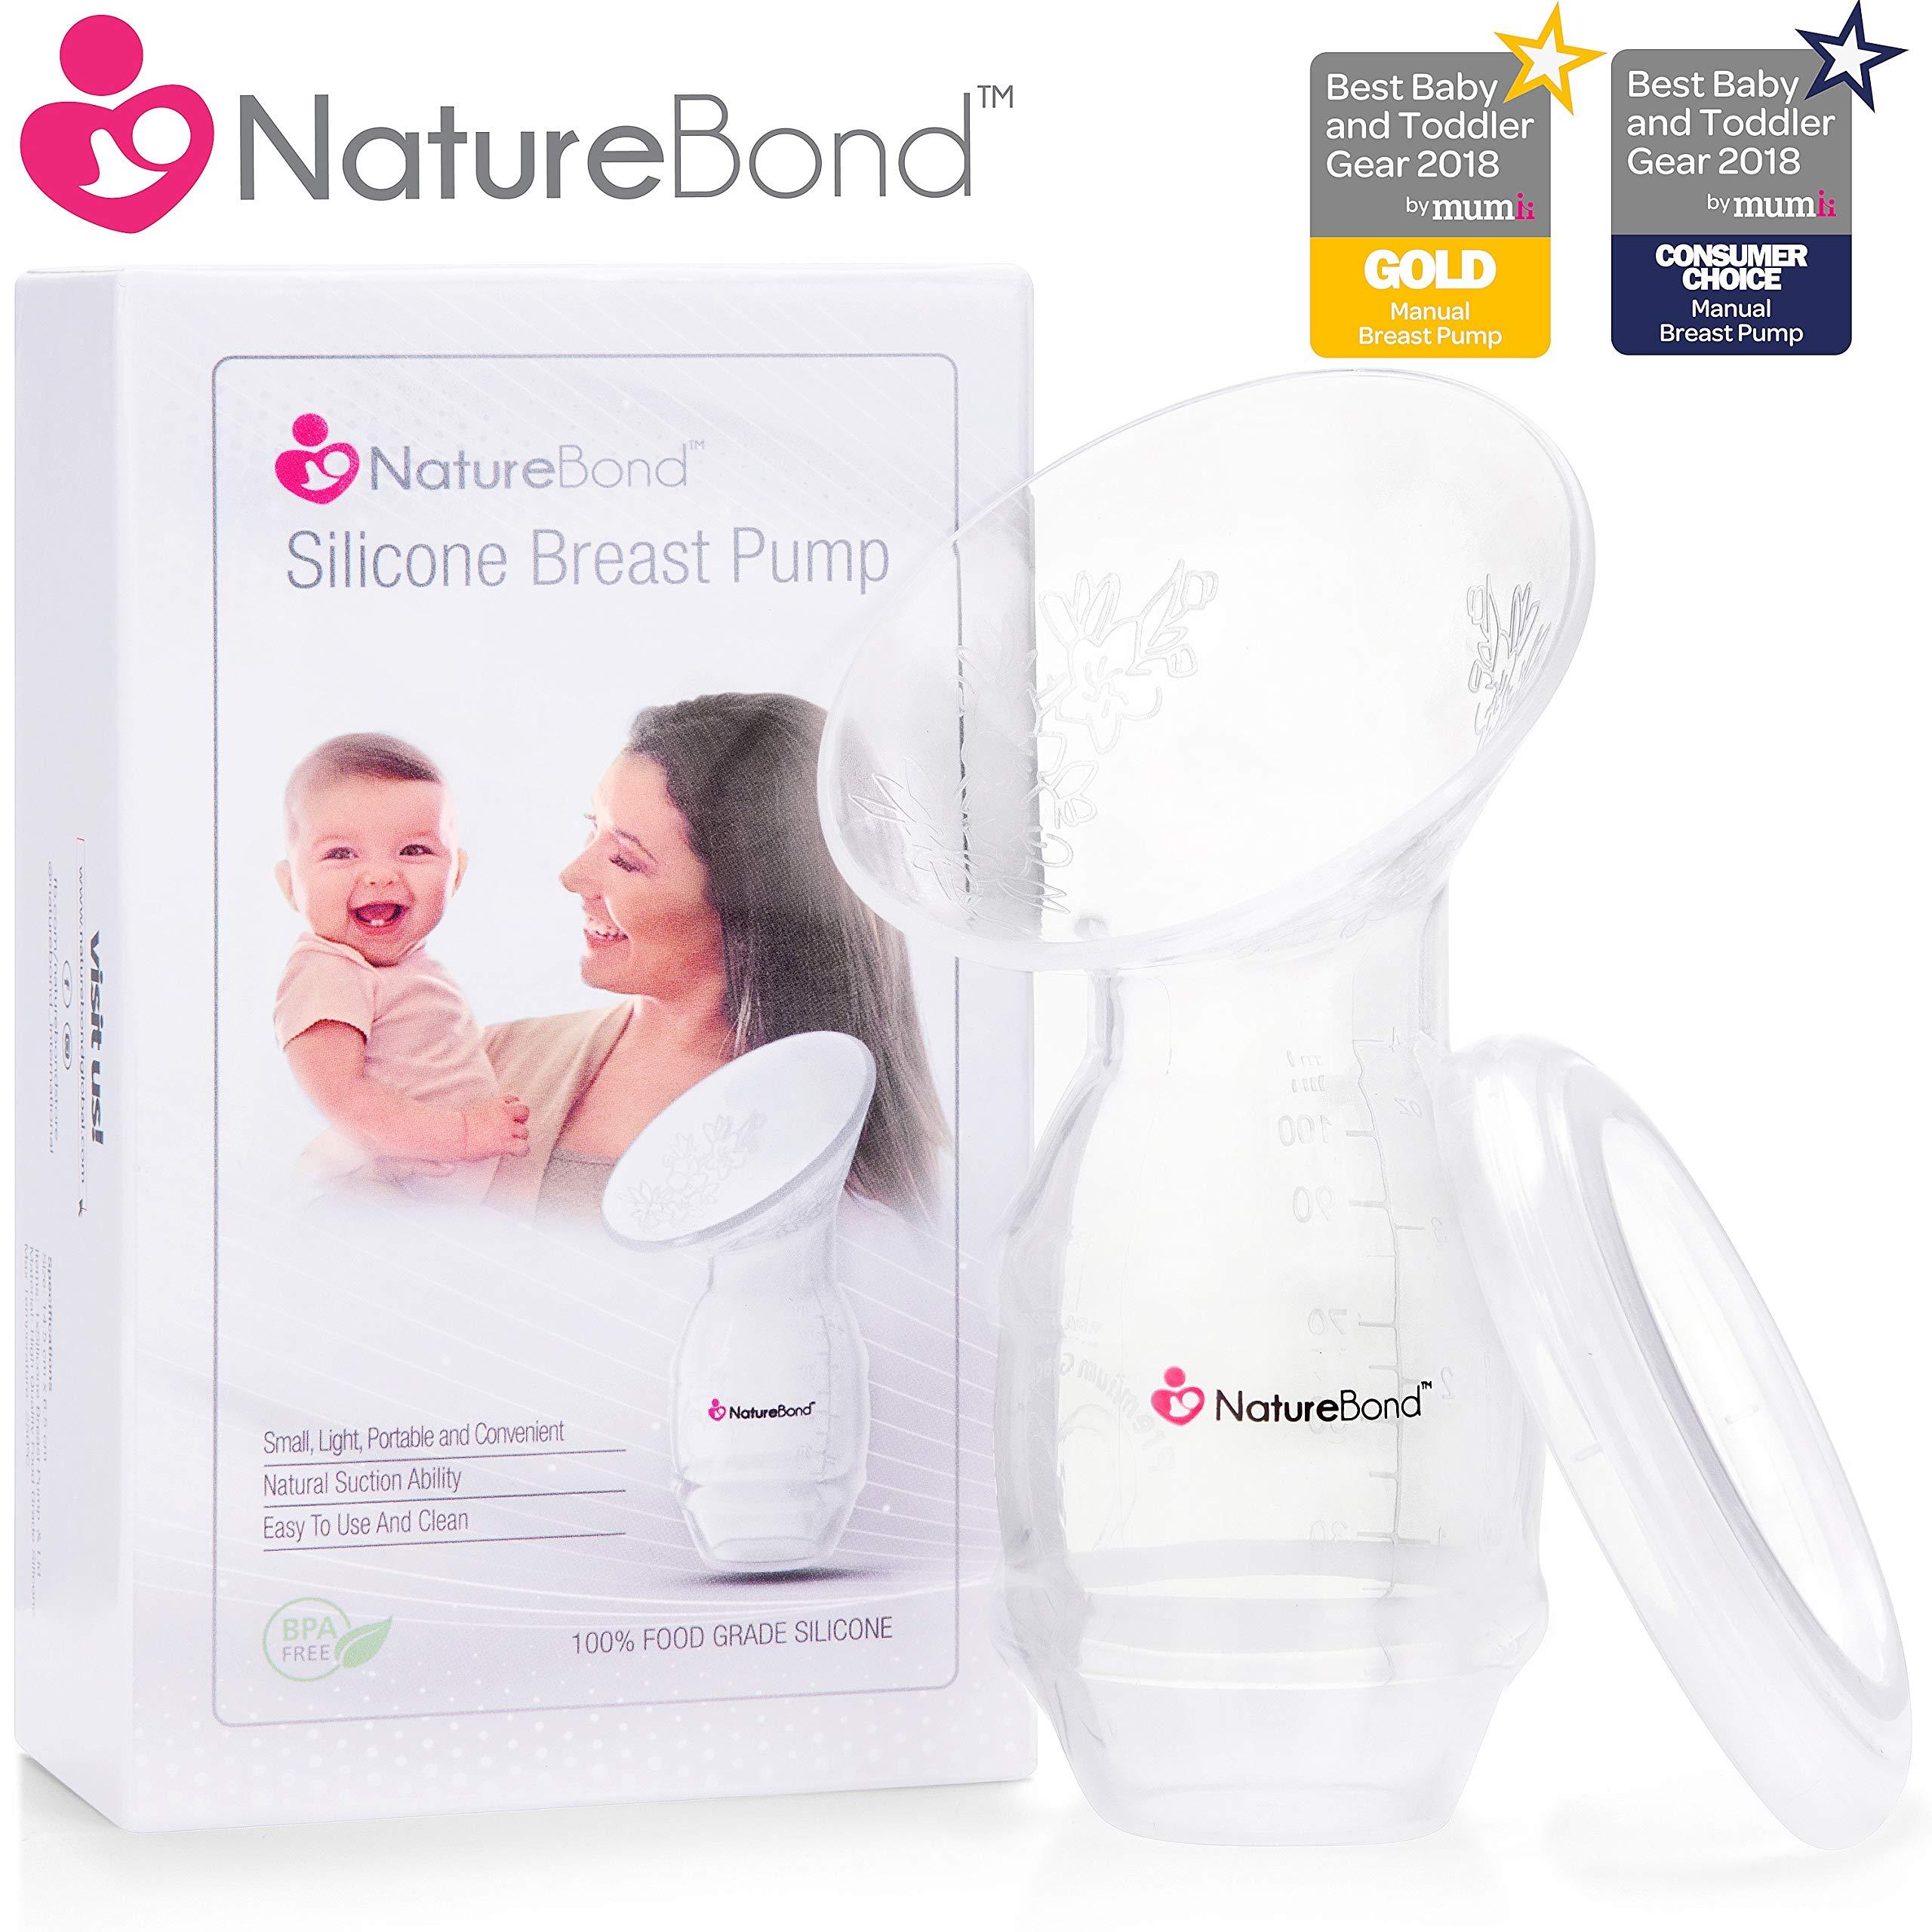 NatureBond Silicone Breastfeeding Manual Breast Pump Milk Saver Nursing Pump   Basic Pack Air-Tight Vacuum Sealed in Hardcover Gift Box. BPA Free by NatureBond